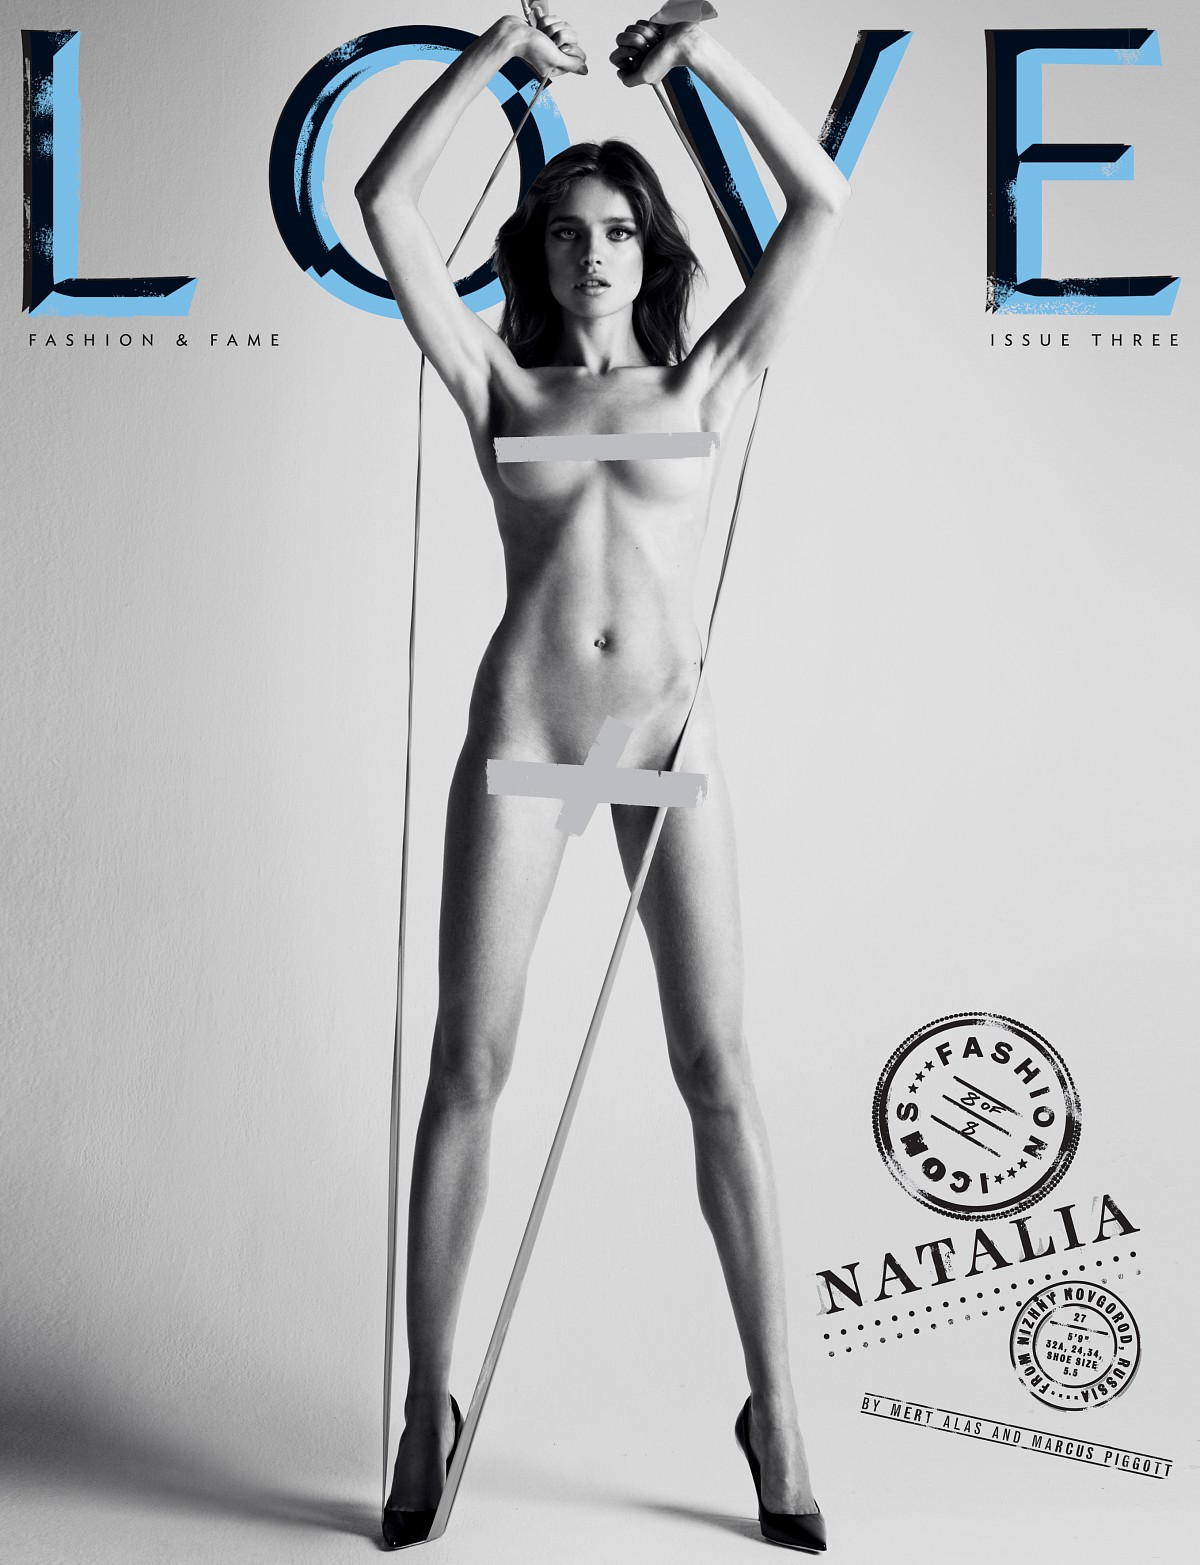 Lady Gaga Nackt Bilder Bondage Vogue Japan DAILY